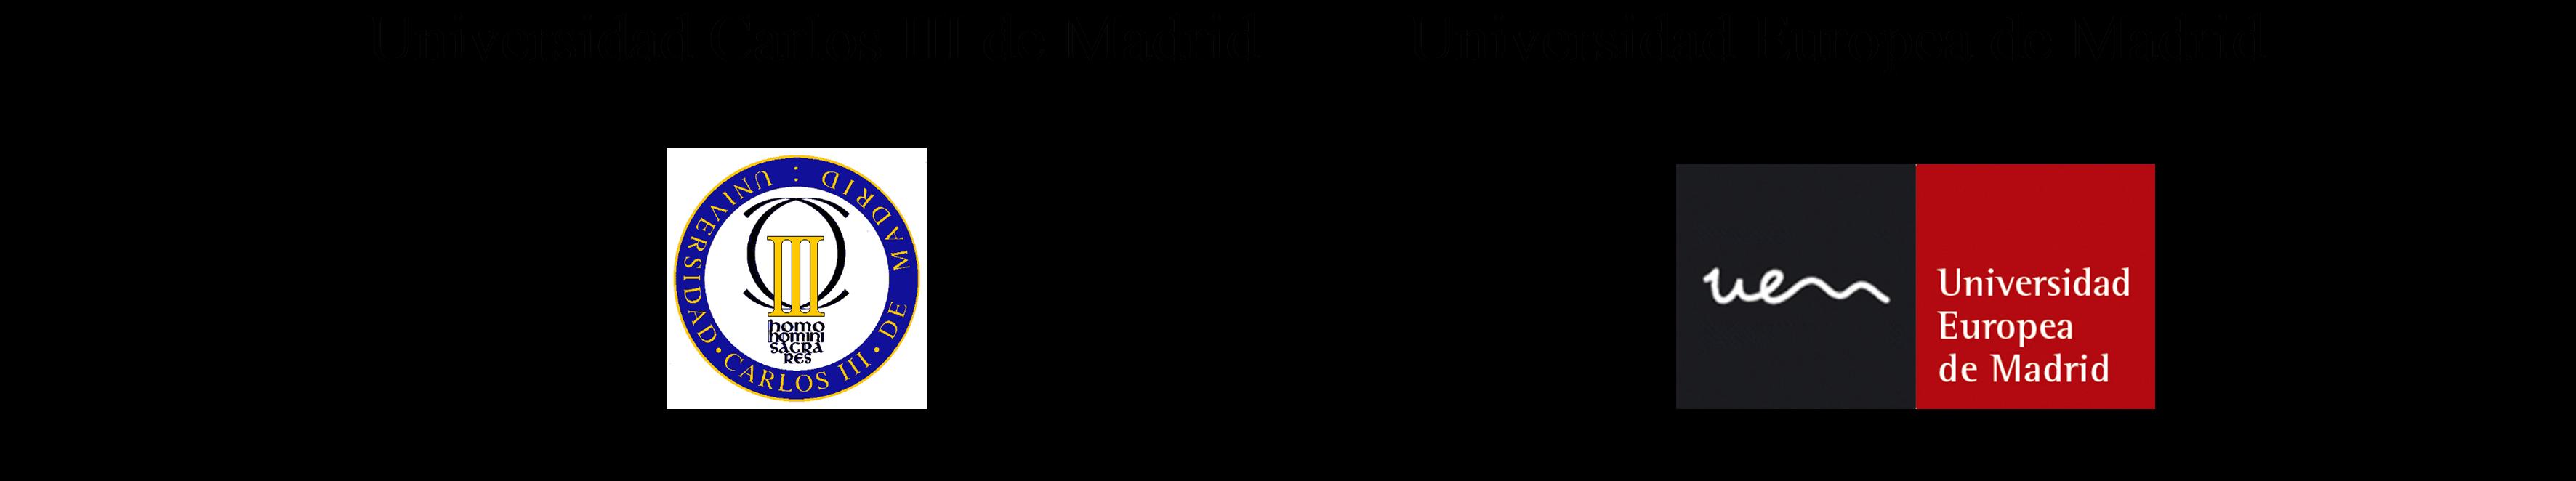 Logo_UC3M_UEM